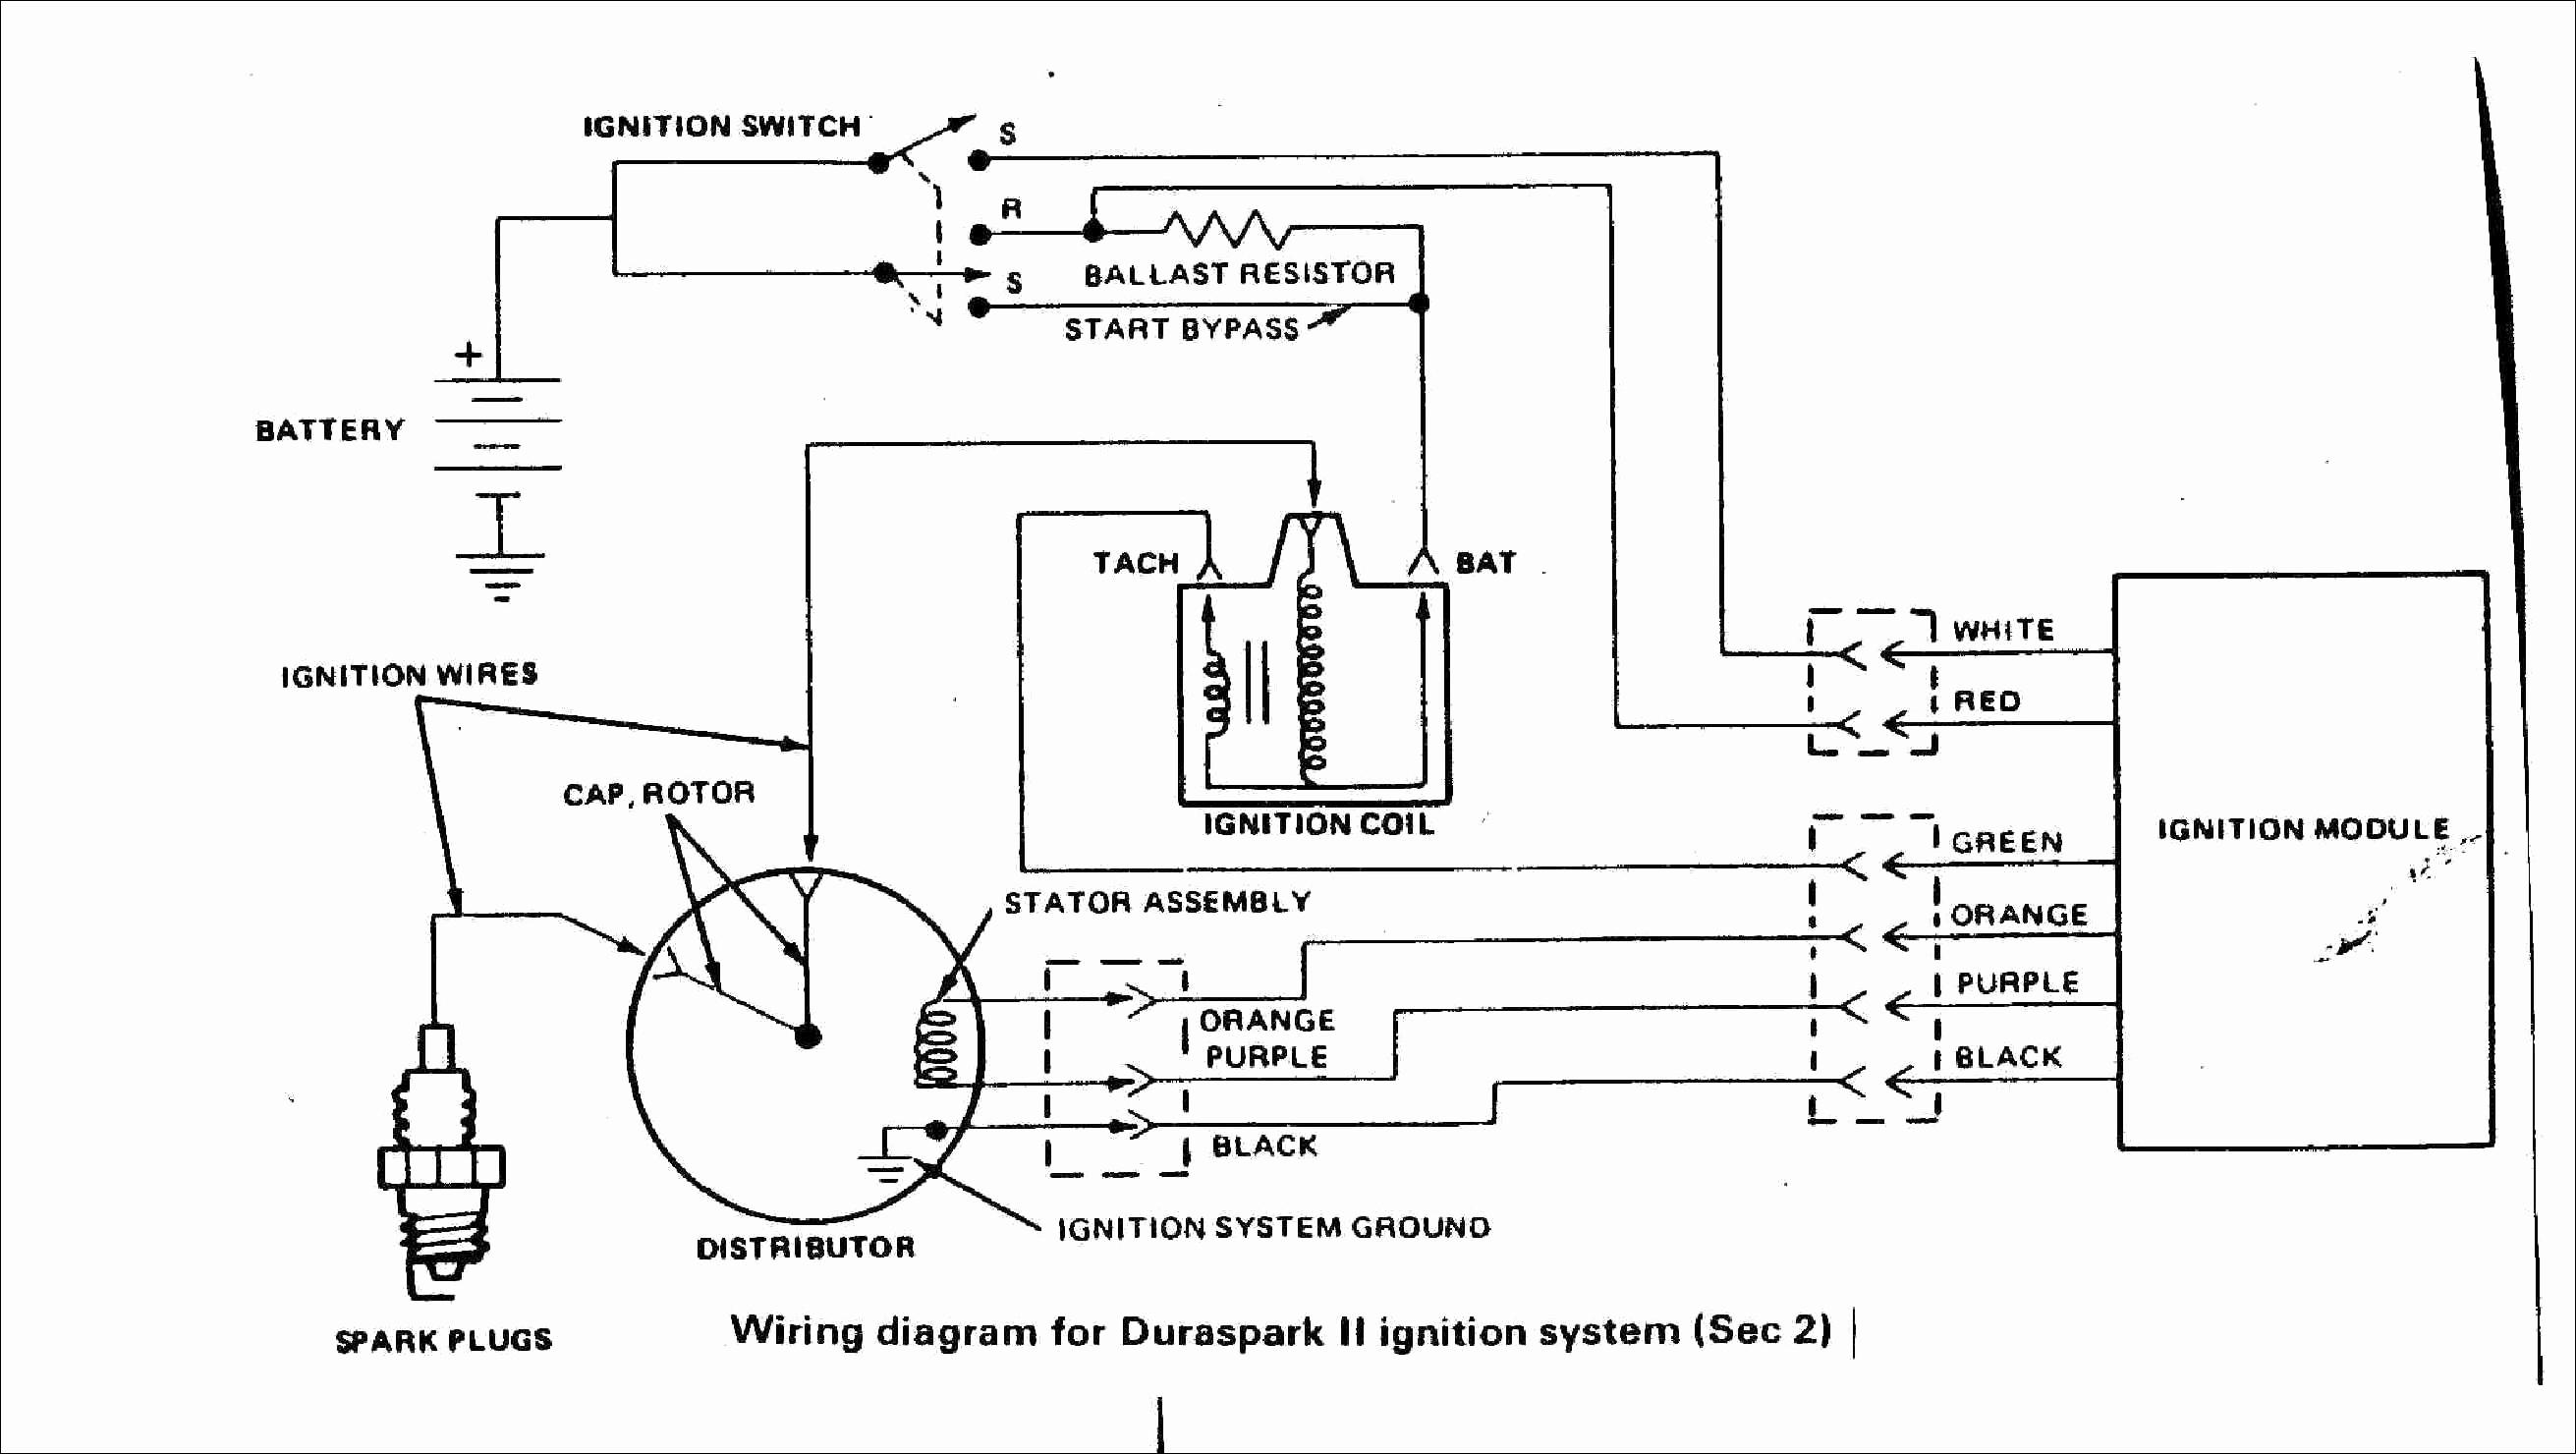 Mower Switch Wiring Diagram | Wiring Diagram - Mtd Riding Lawn Mower Wiring Diagram